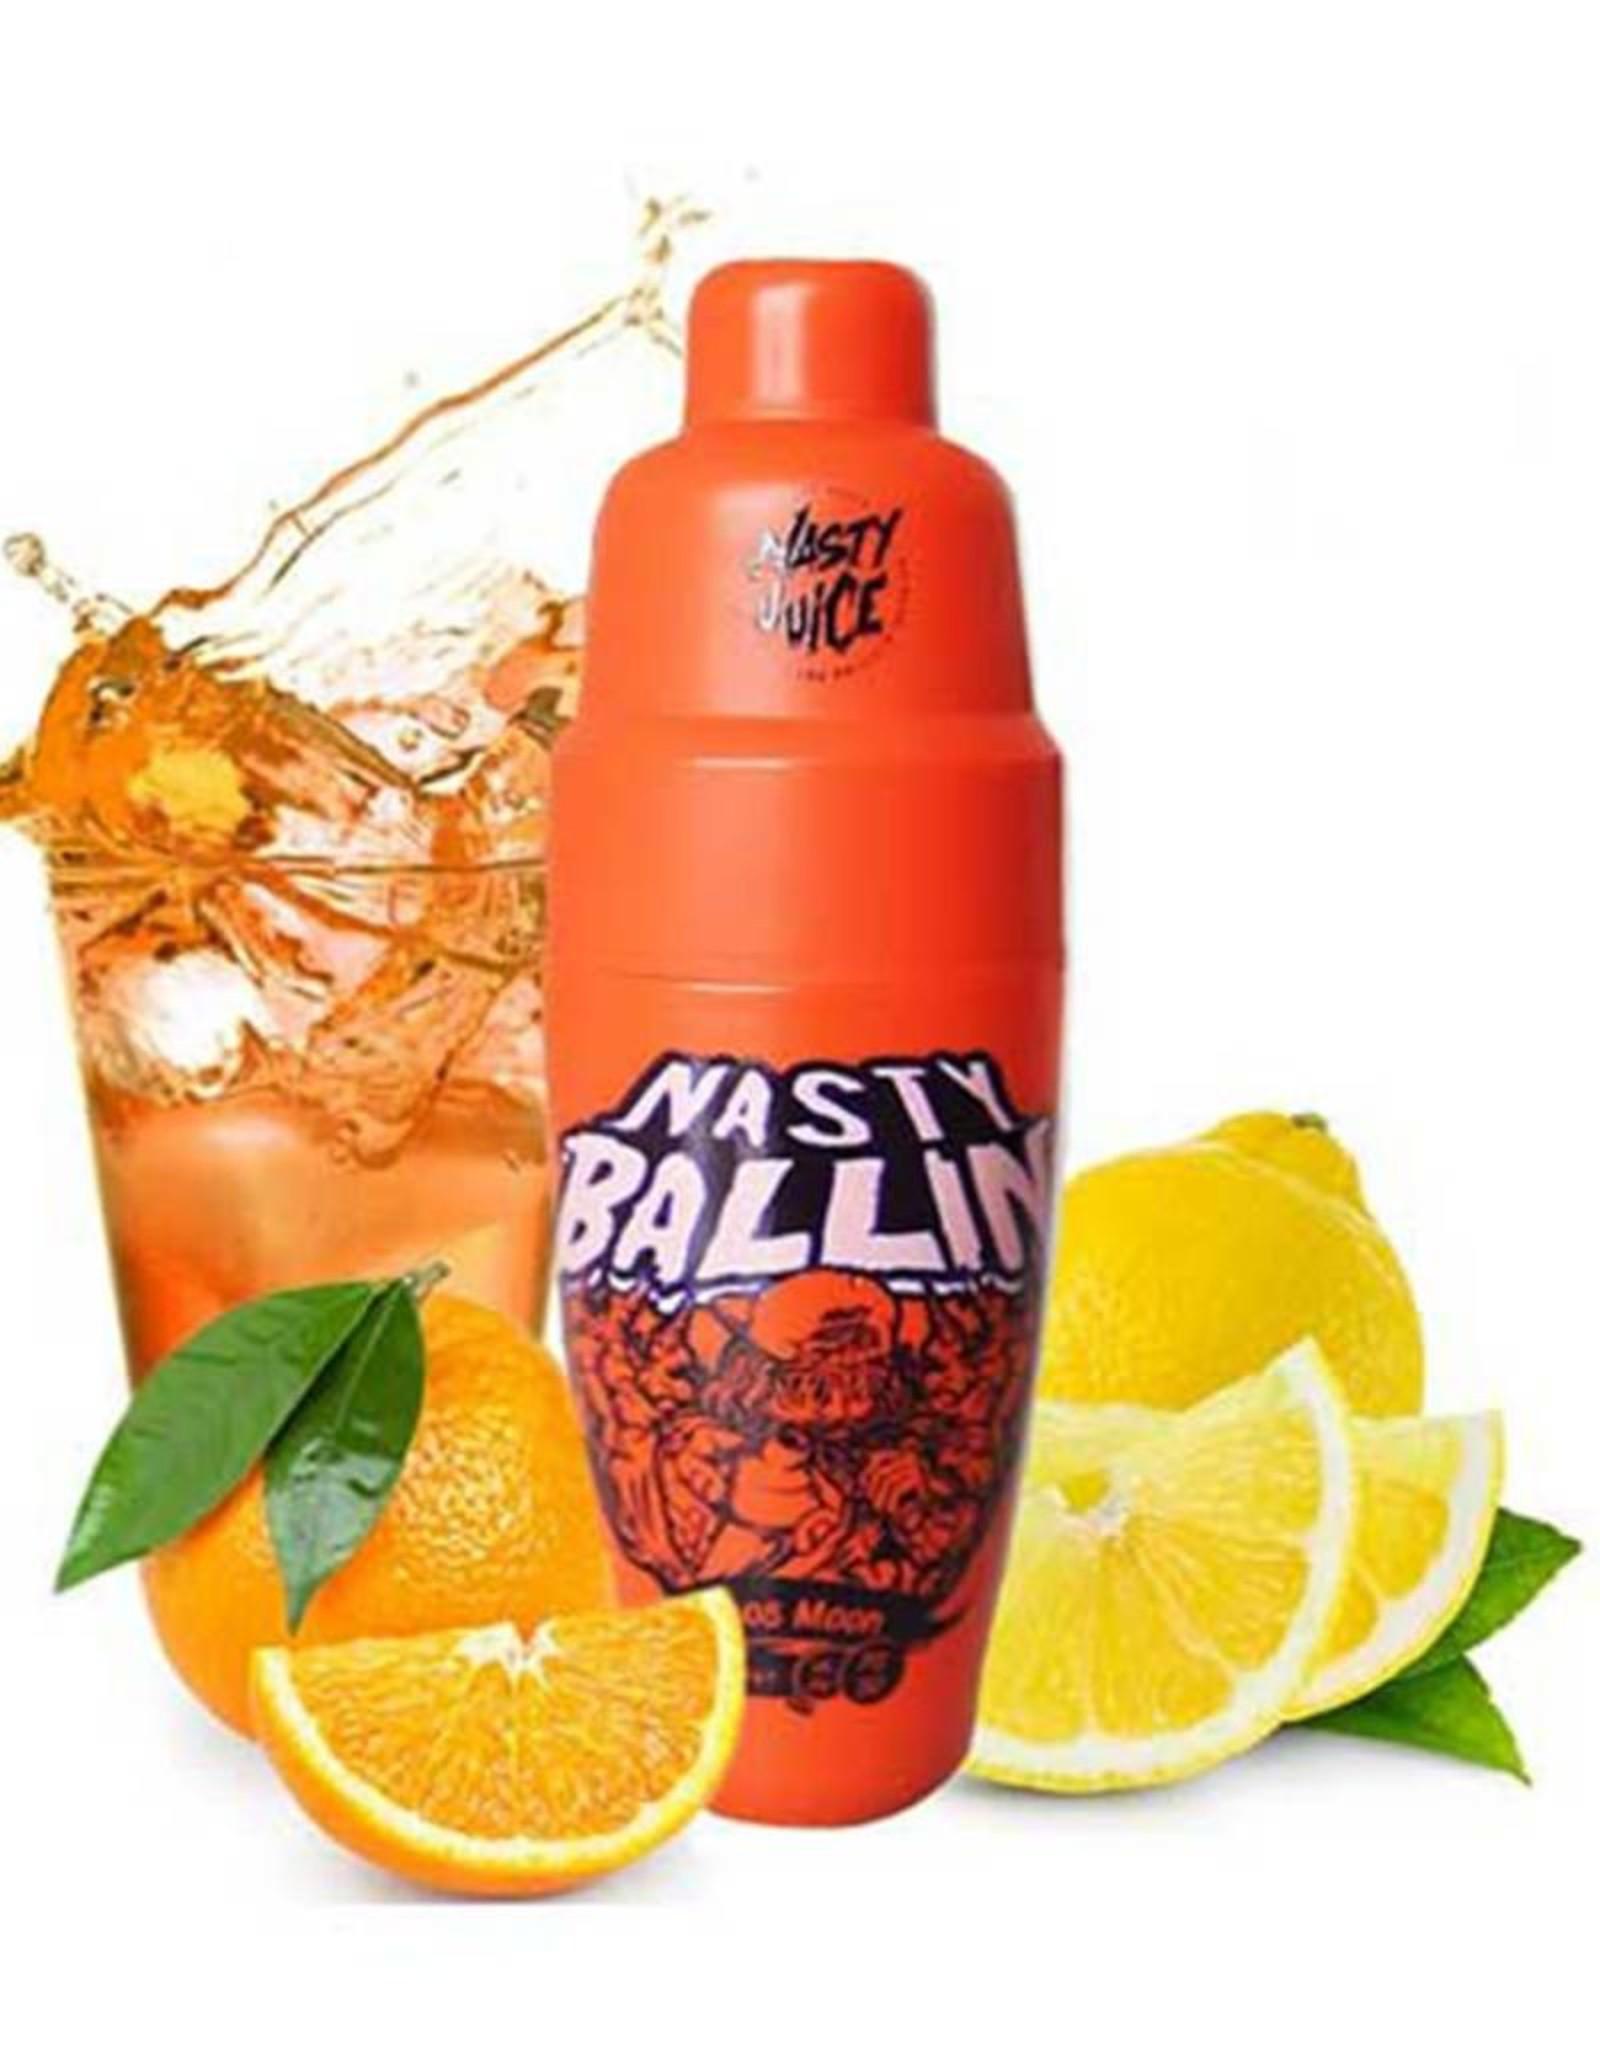 Nasty Juice Nasty Juice - Migos Moon (Ballin Line) (60mL)